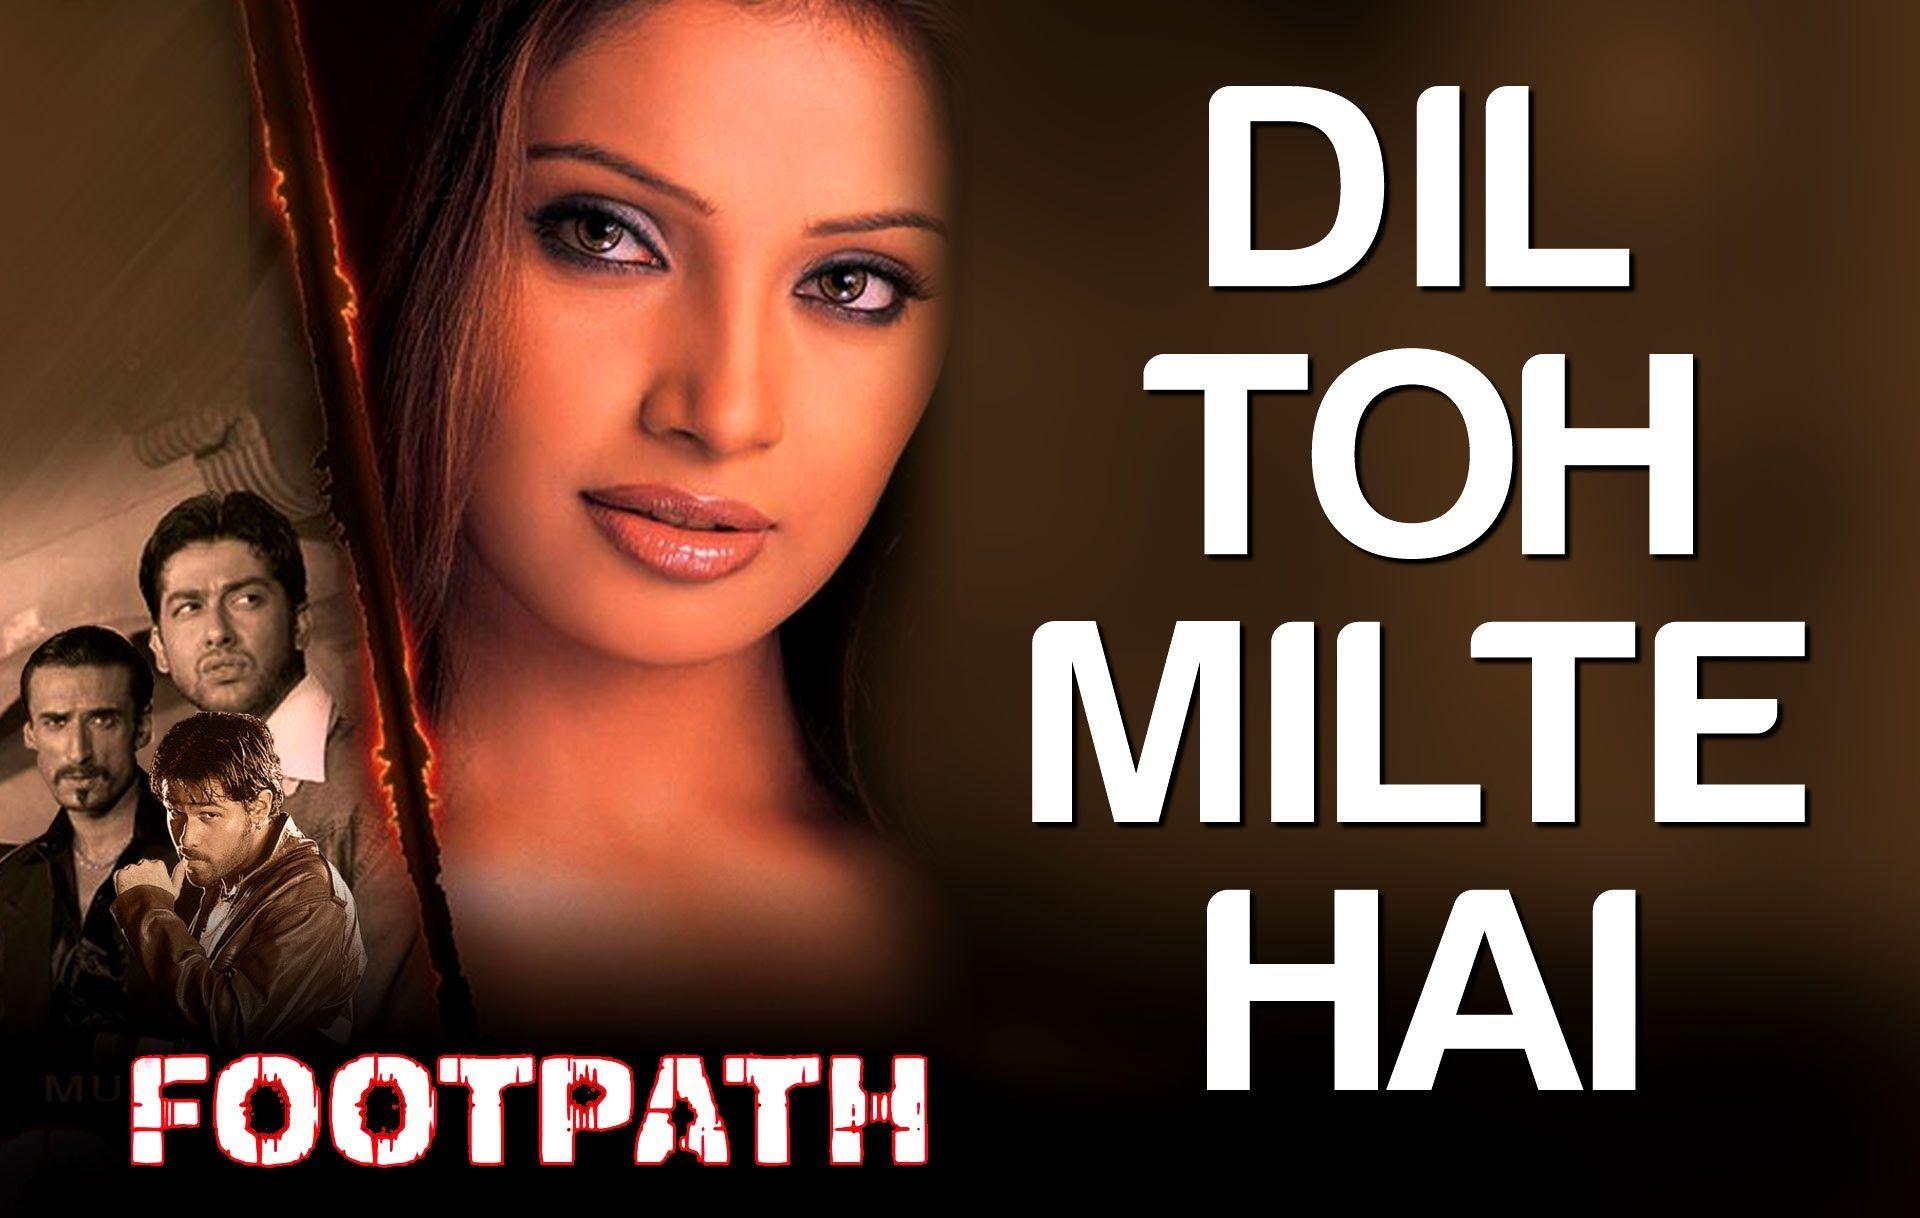 Dil Toh Milte Hai Footpath Aftab Shivadasani Emraan Hashmi